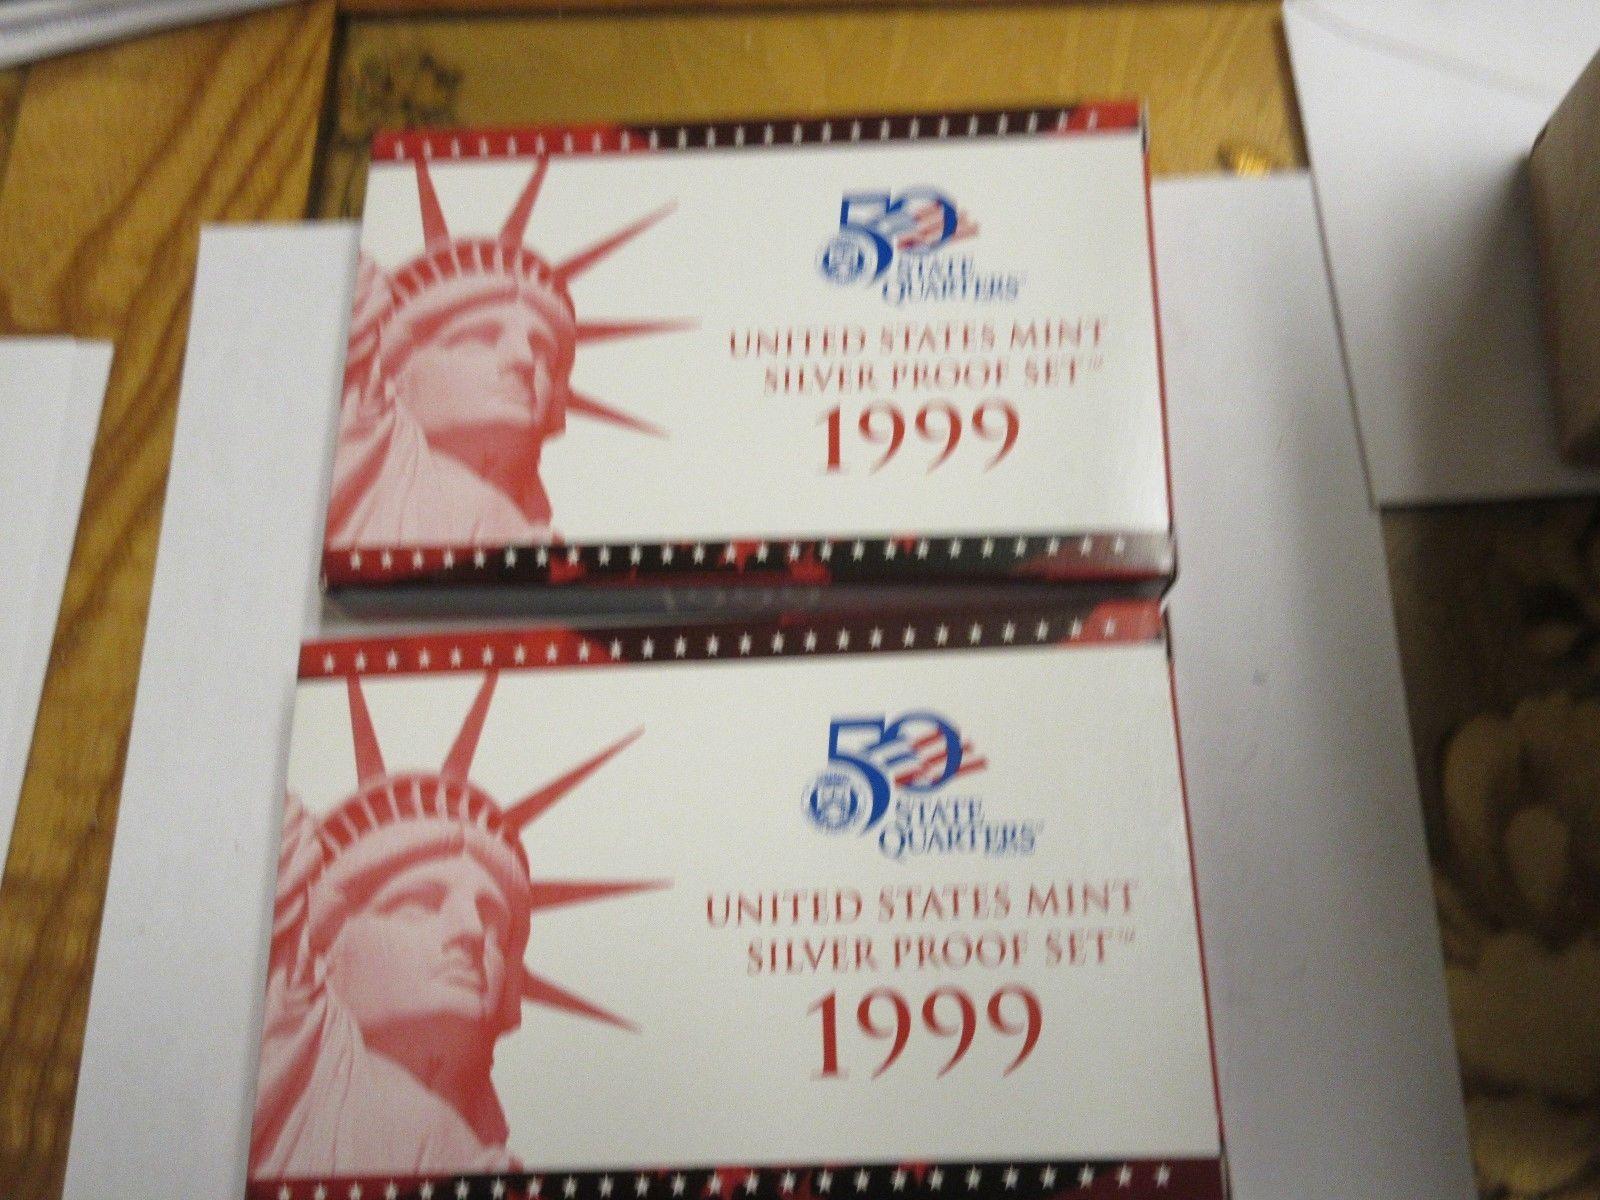 1999 , US. Mint Silver Proof Set , Lot of 2 , 9 Coin Set , NIB - $222.75